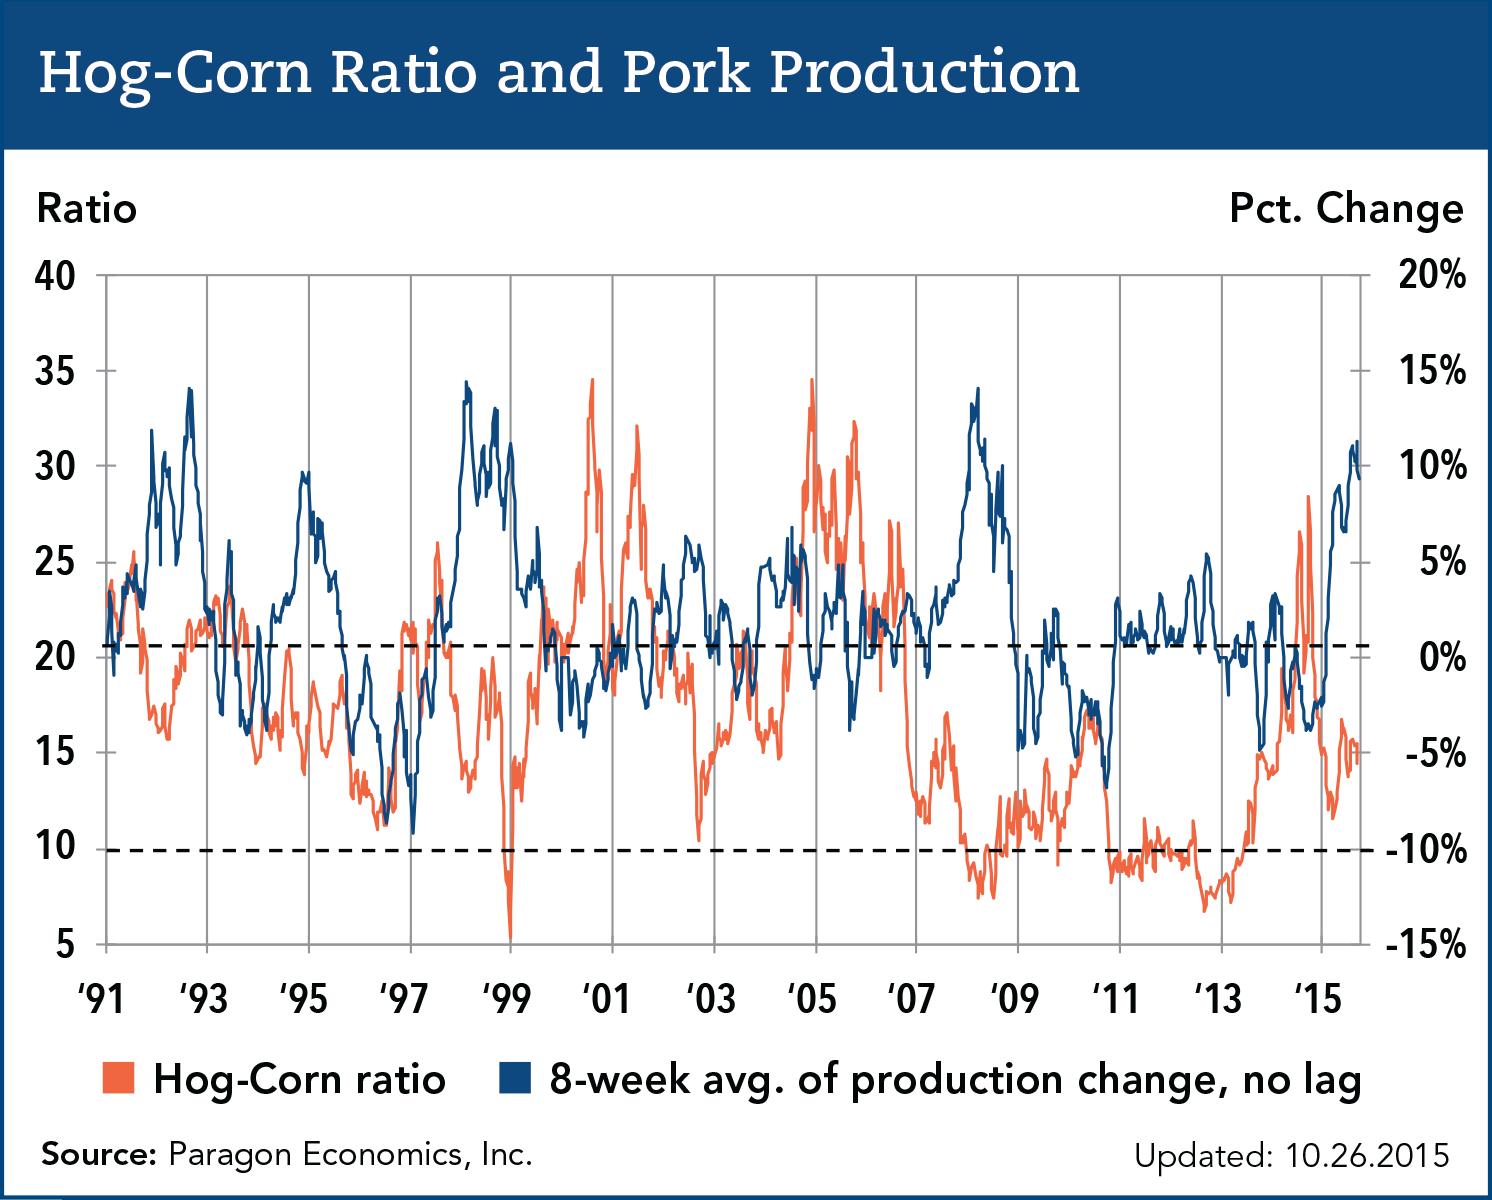 hog corn price ratio and pork production